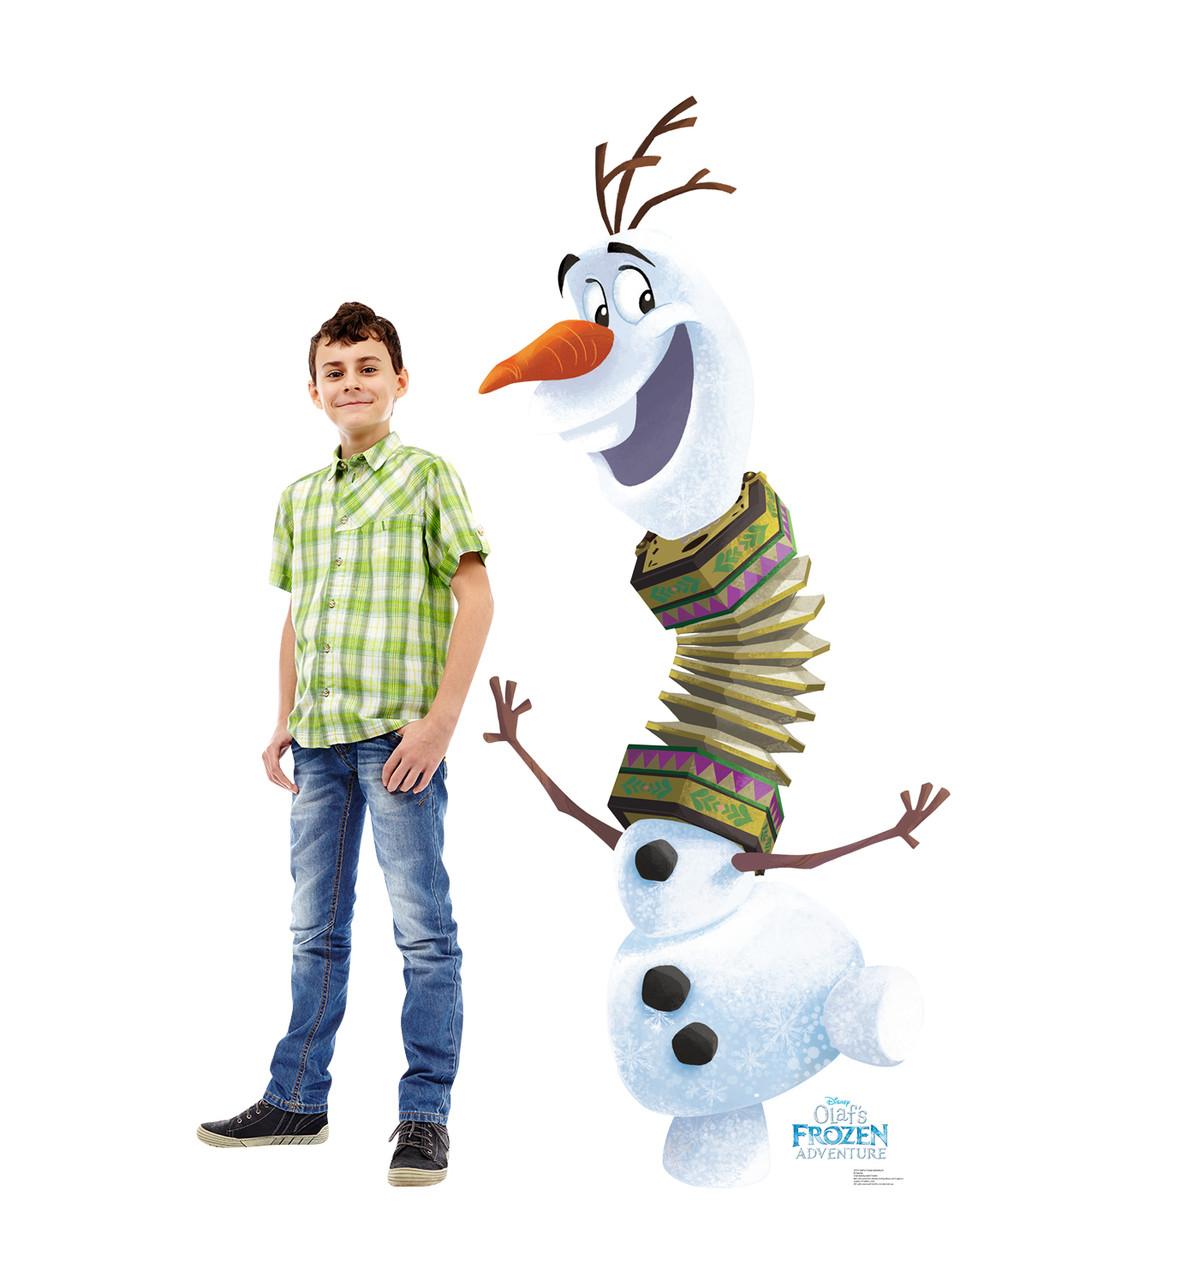 Olafs Frozen Adventure | Cardboard Cutout 3